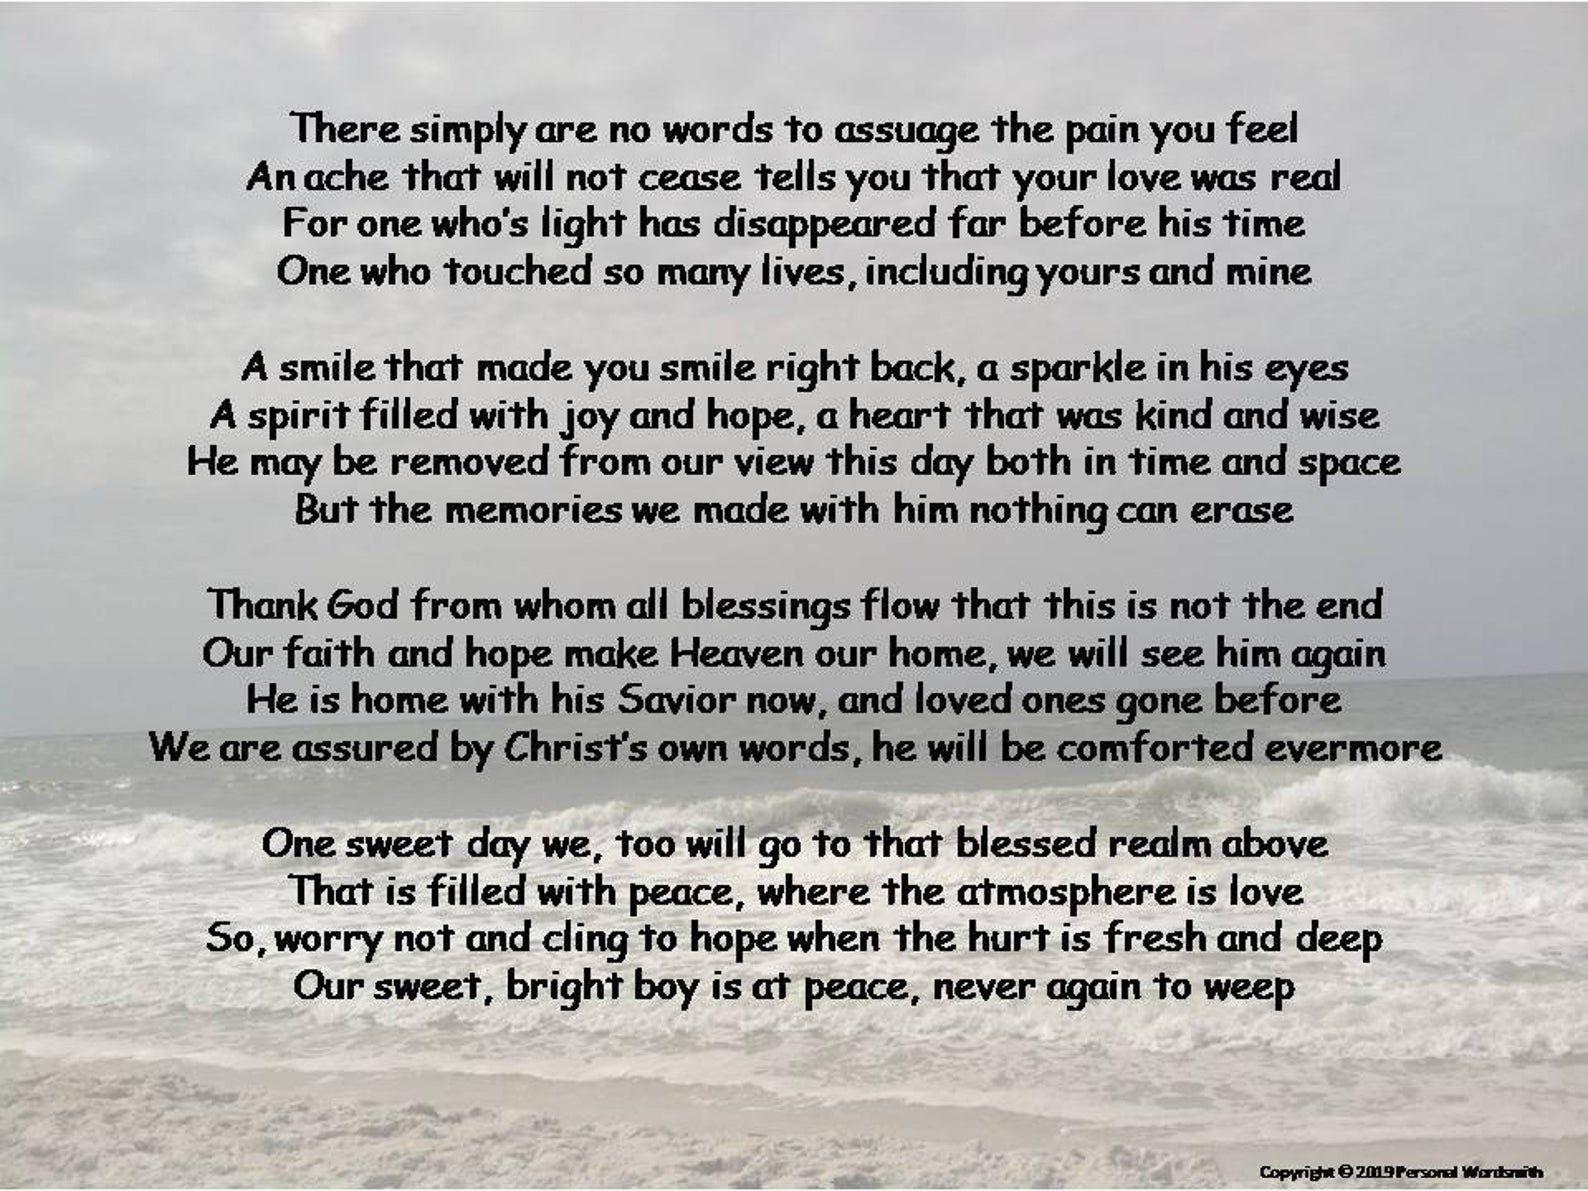 Celebration of Life Poetry Download Funeral Poem Print | Etsy